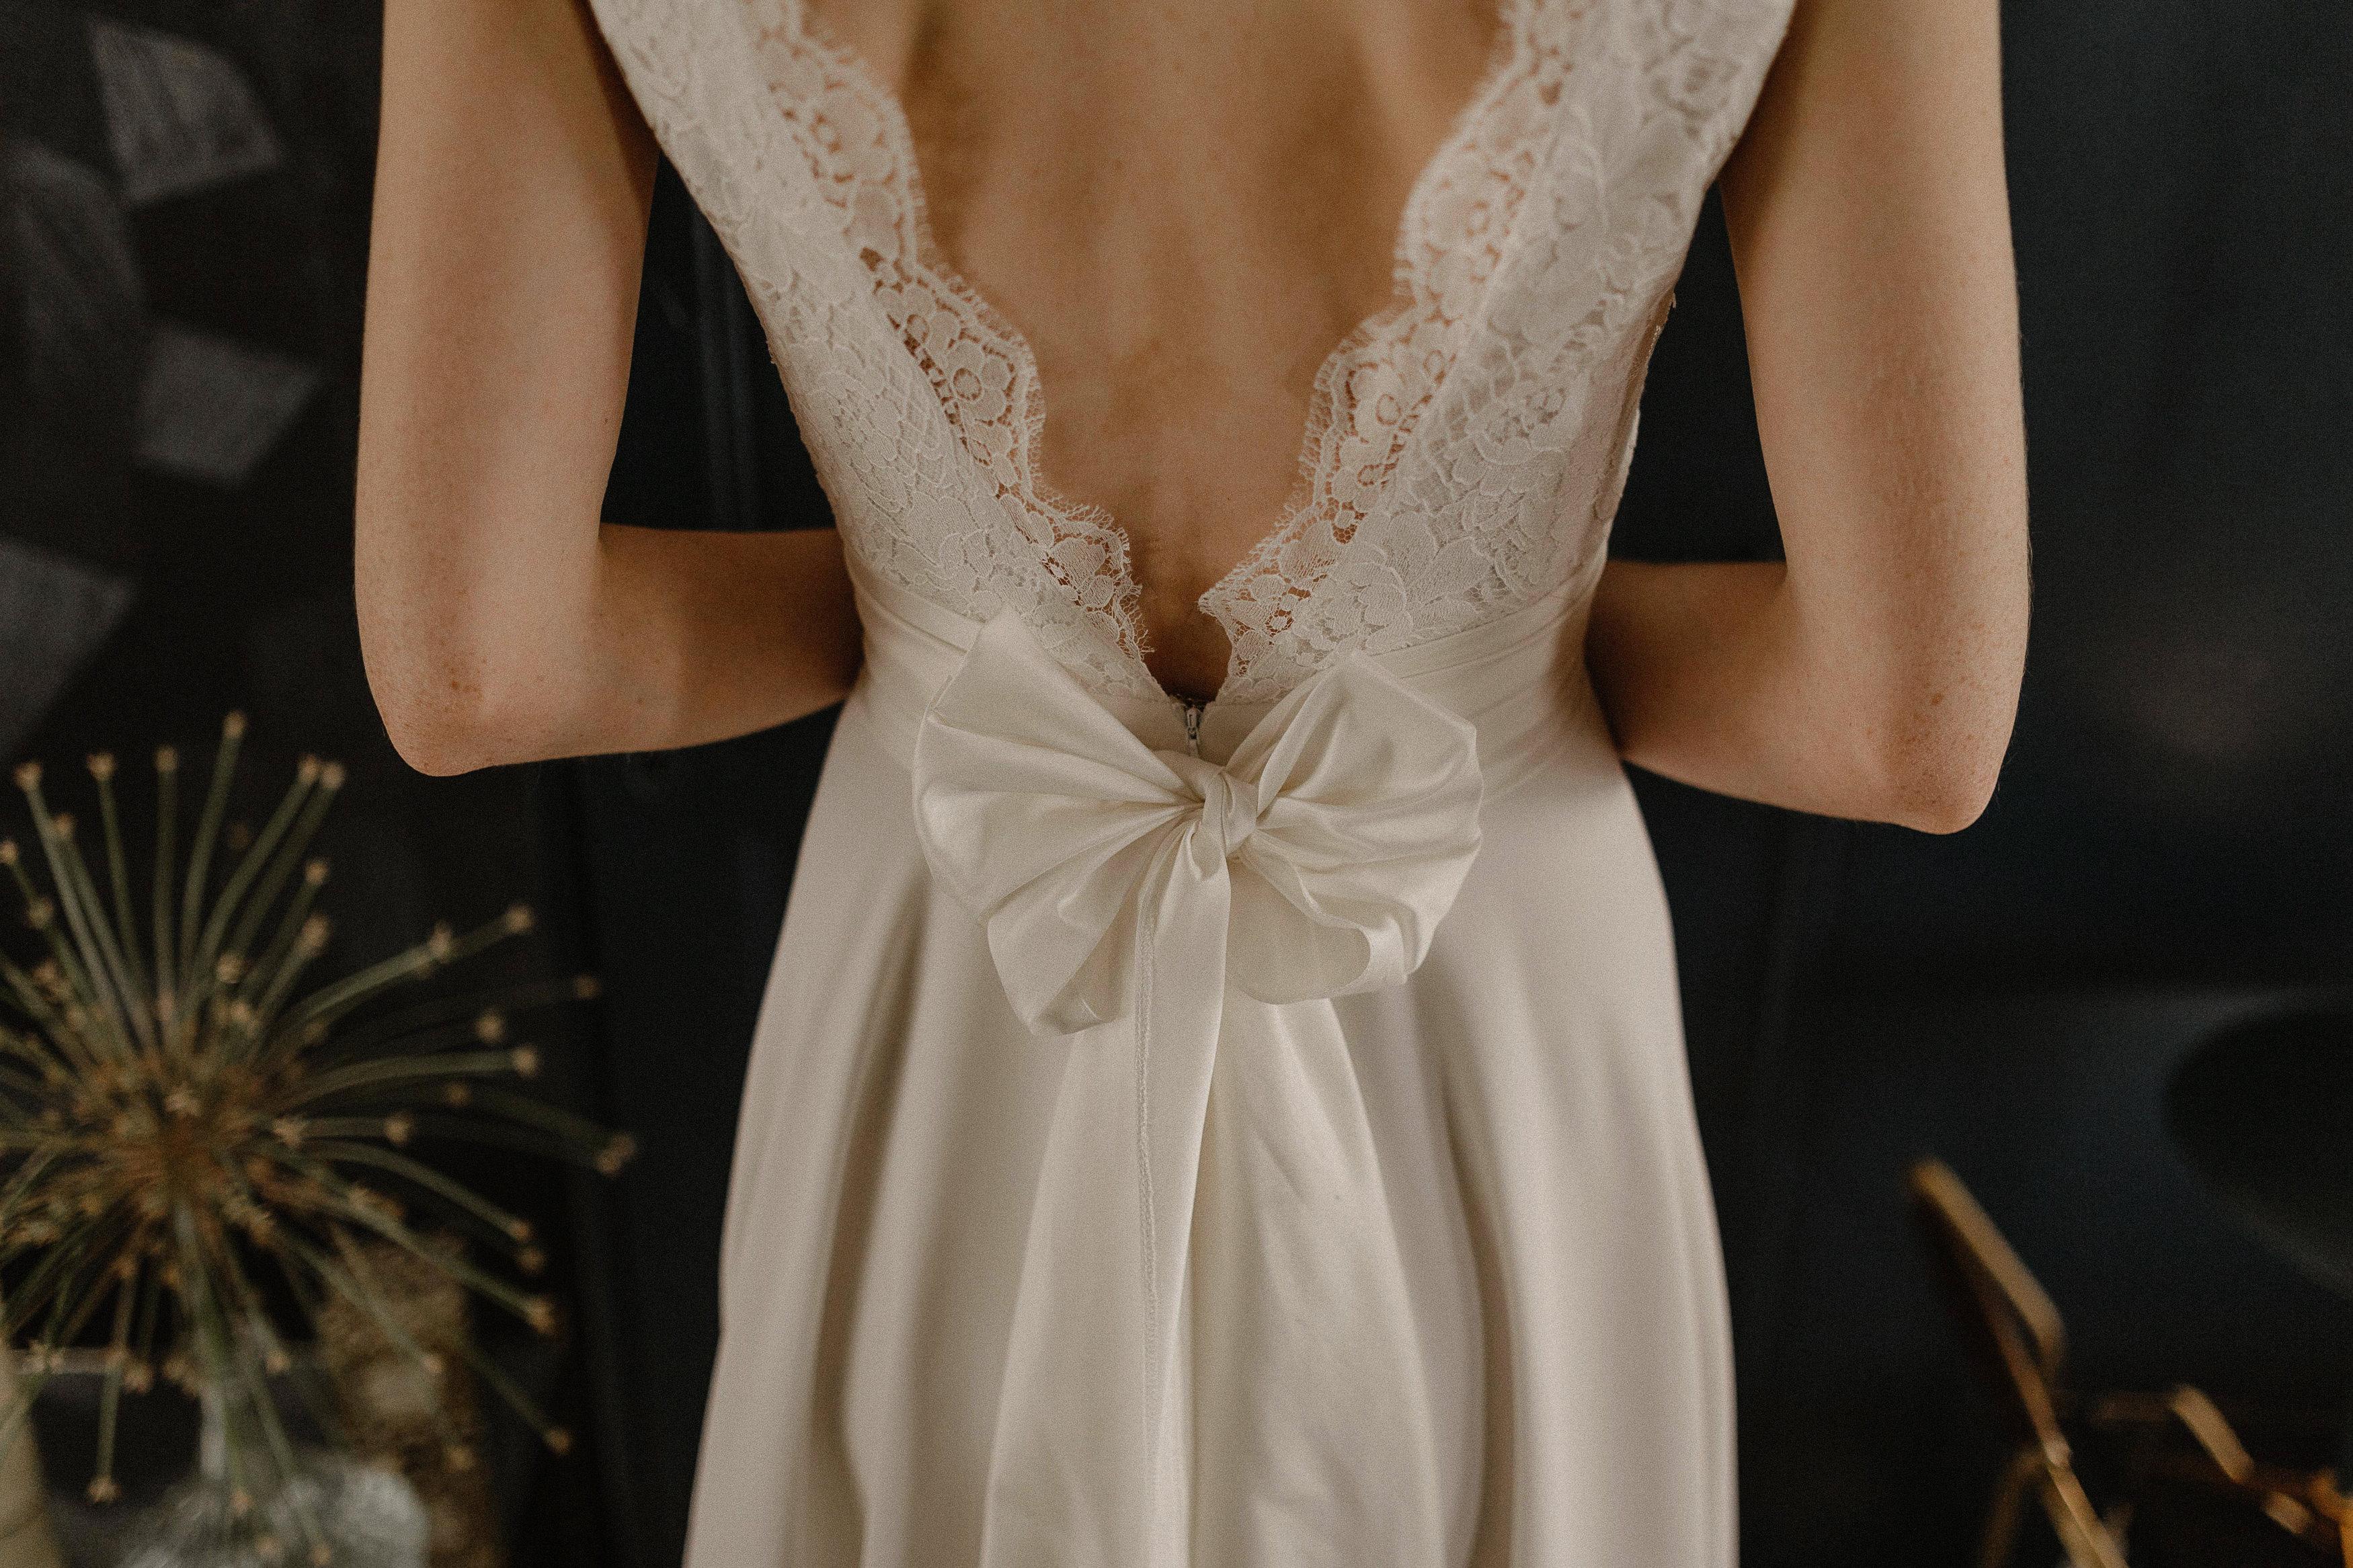 49_boheme-rock-perfecto-mariage-davidpurves-143-2